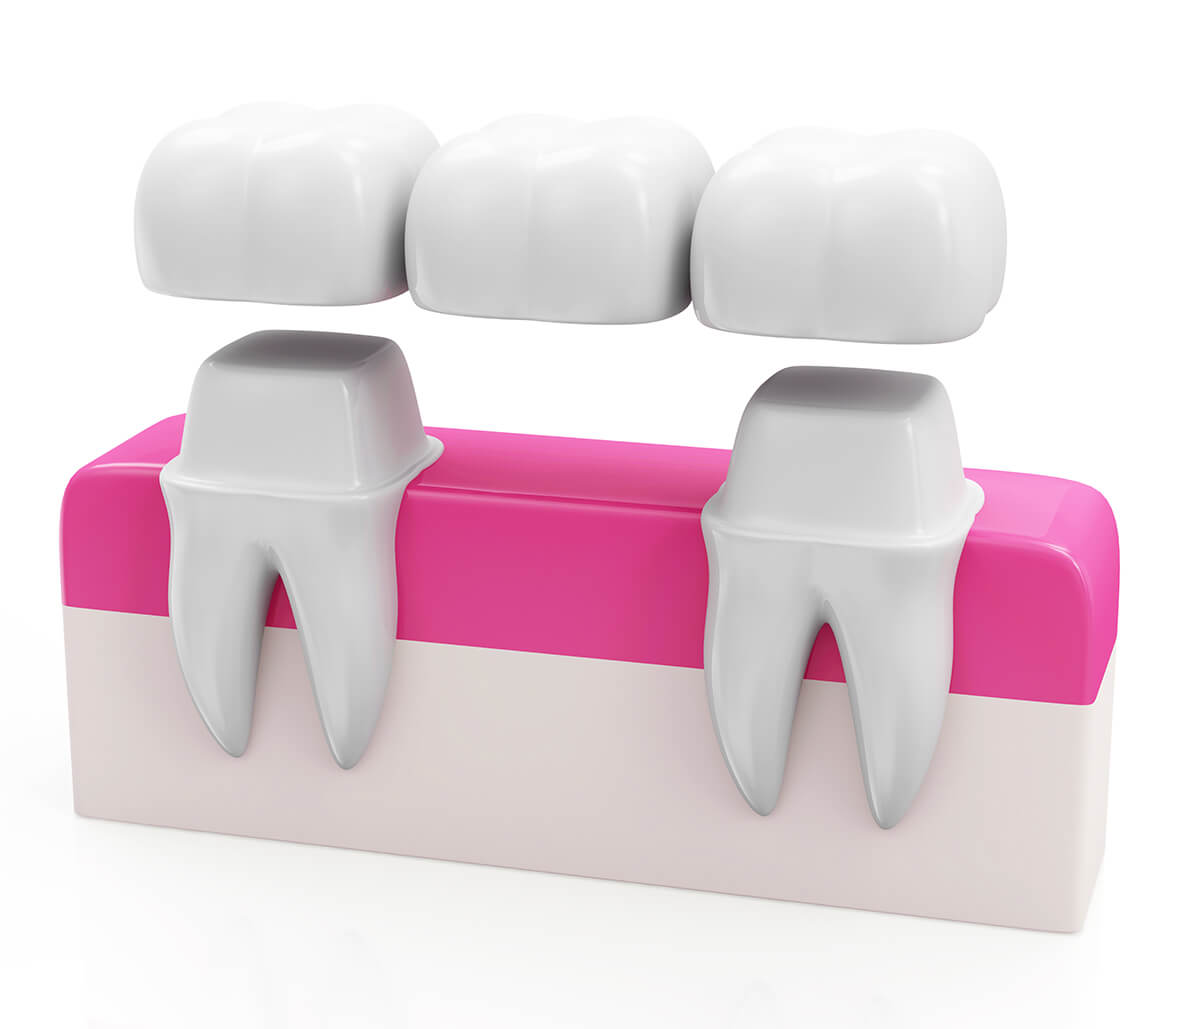 Dental Bridges Procedure in Richmond VA Area